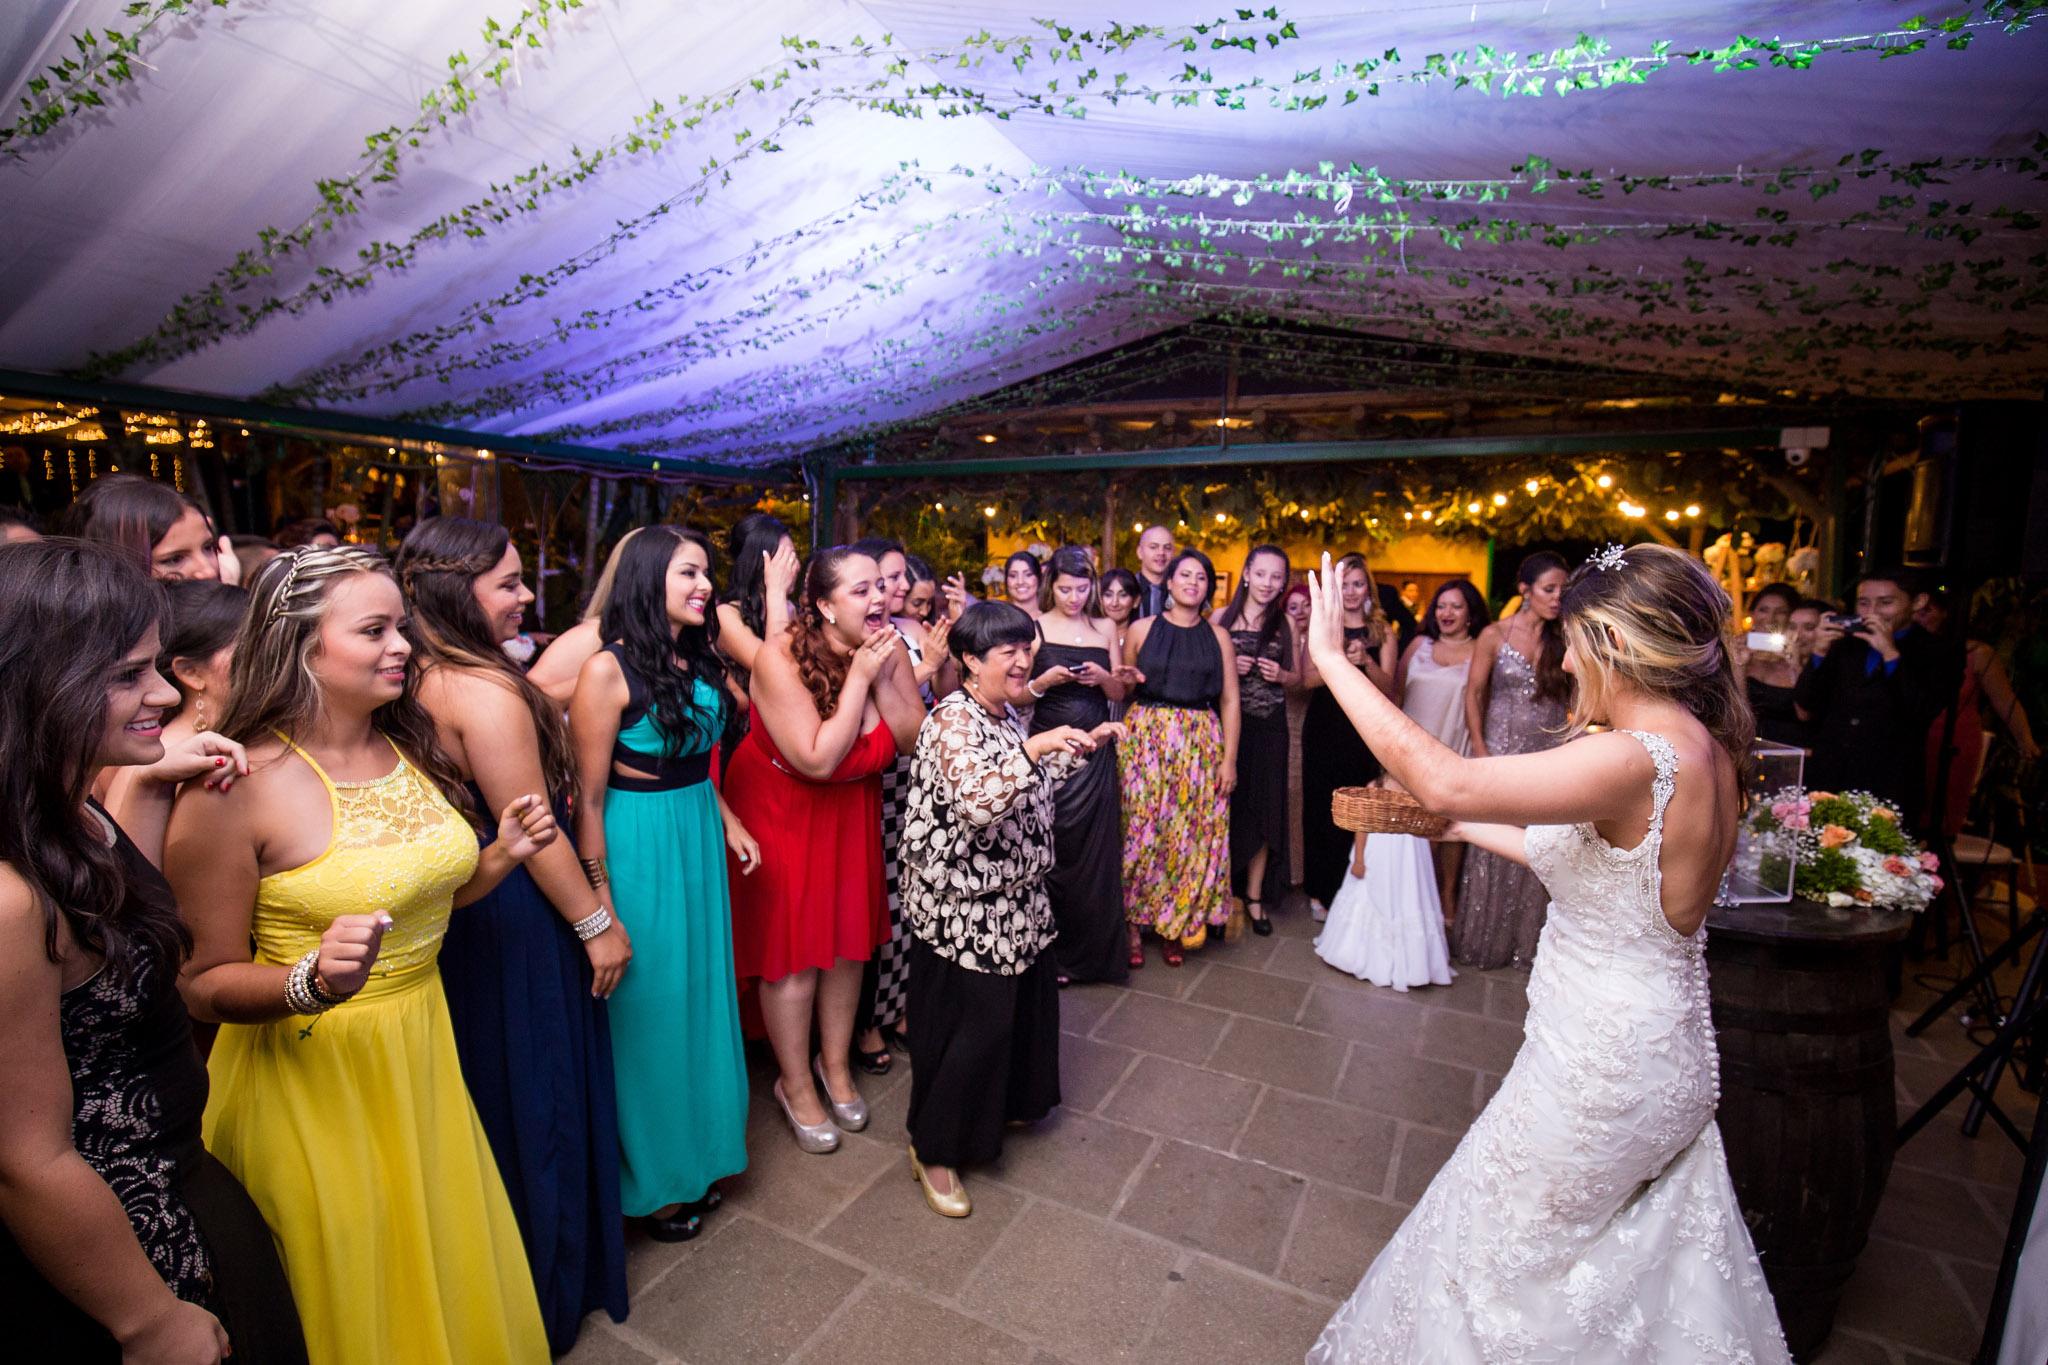 wedding-travellers-destination-wedding-photography-colombia-medellin-chuscalito-bouquet-toss-alternative-locked-key